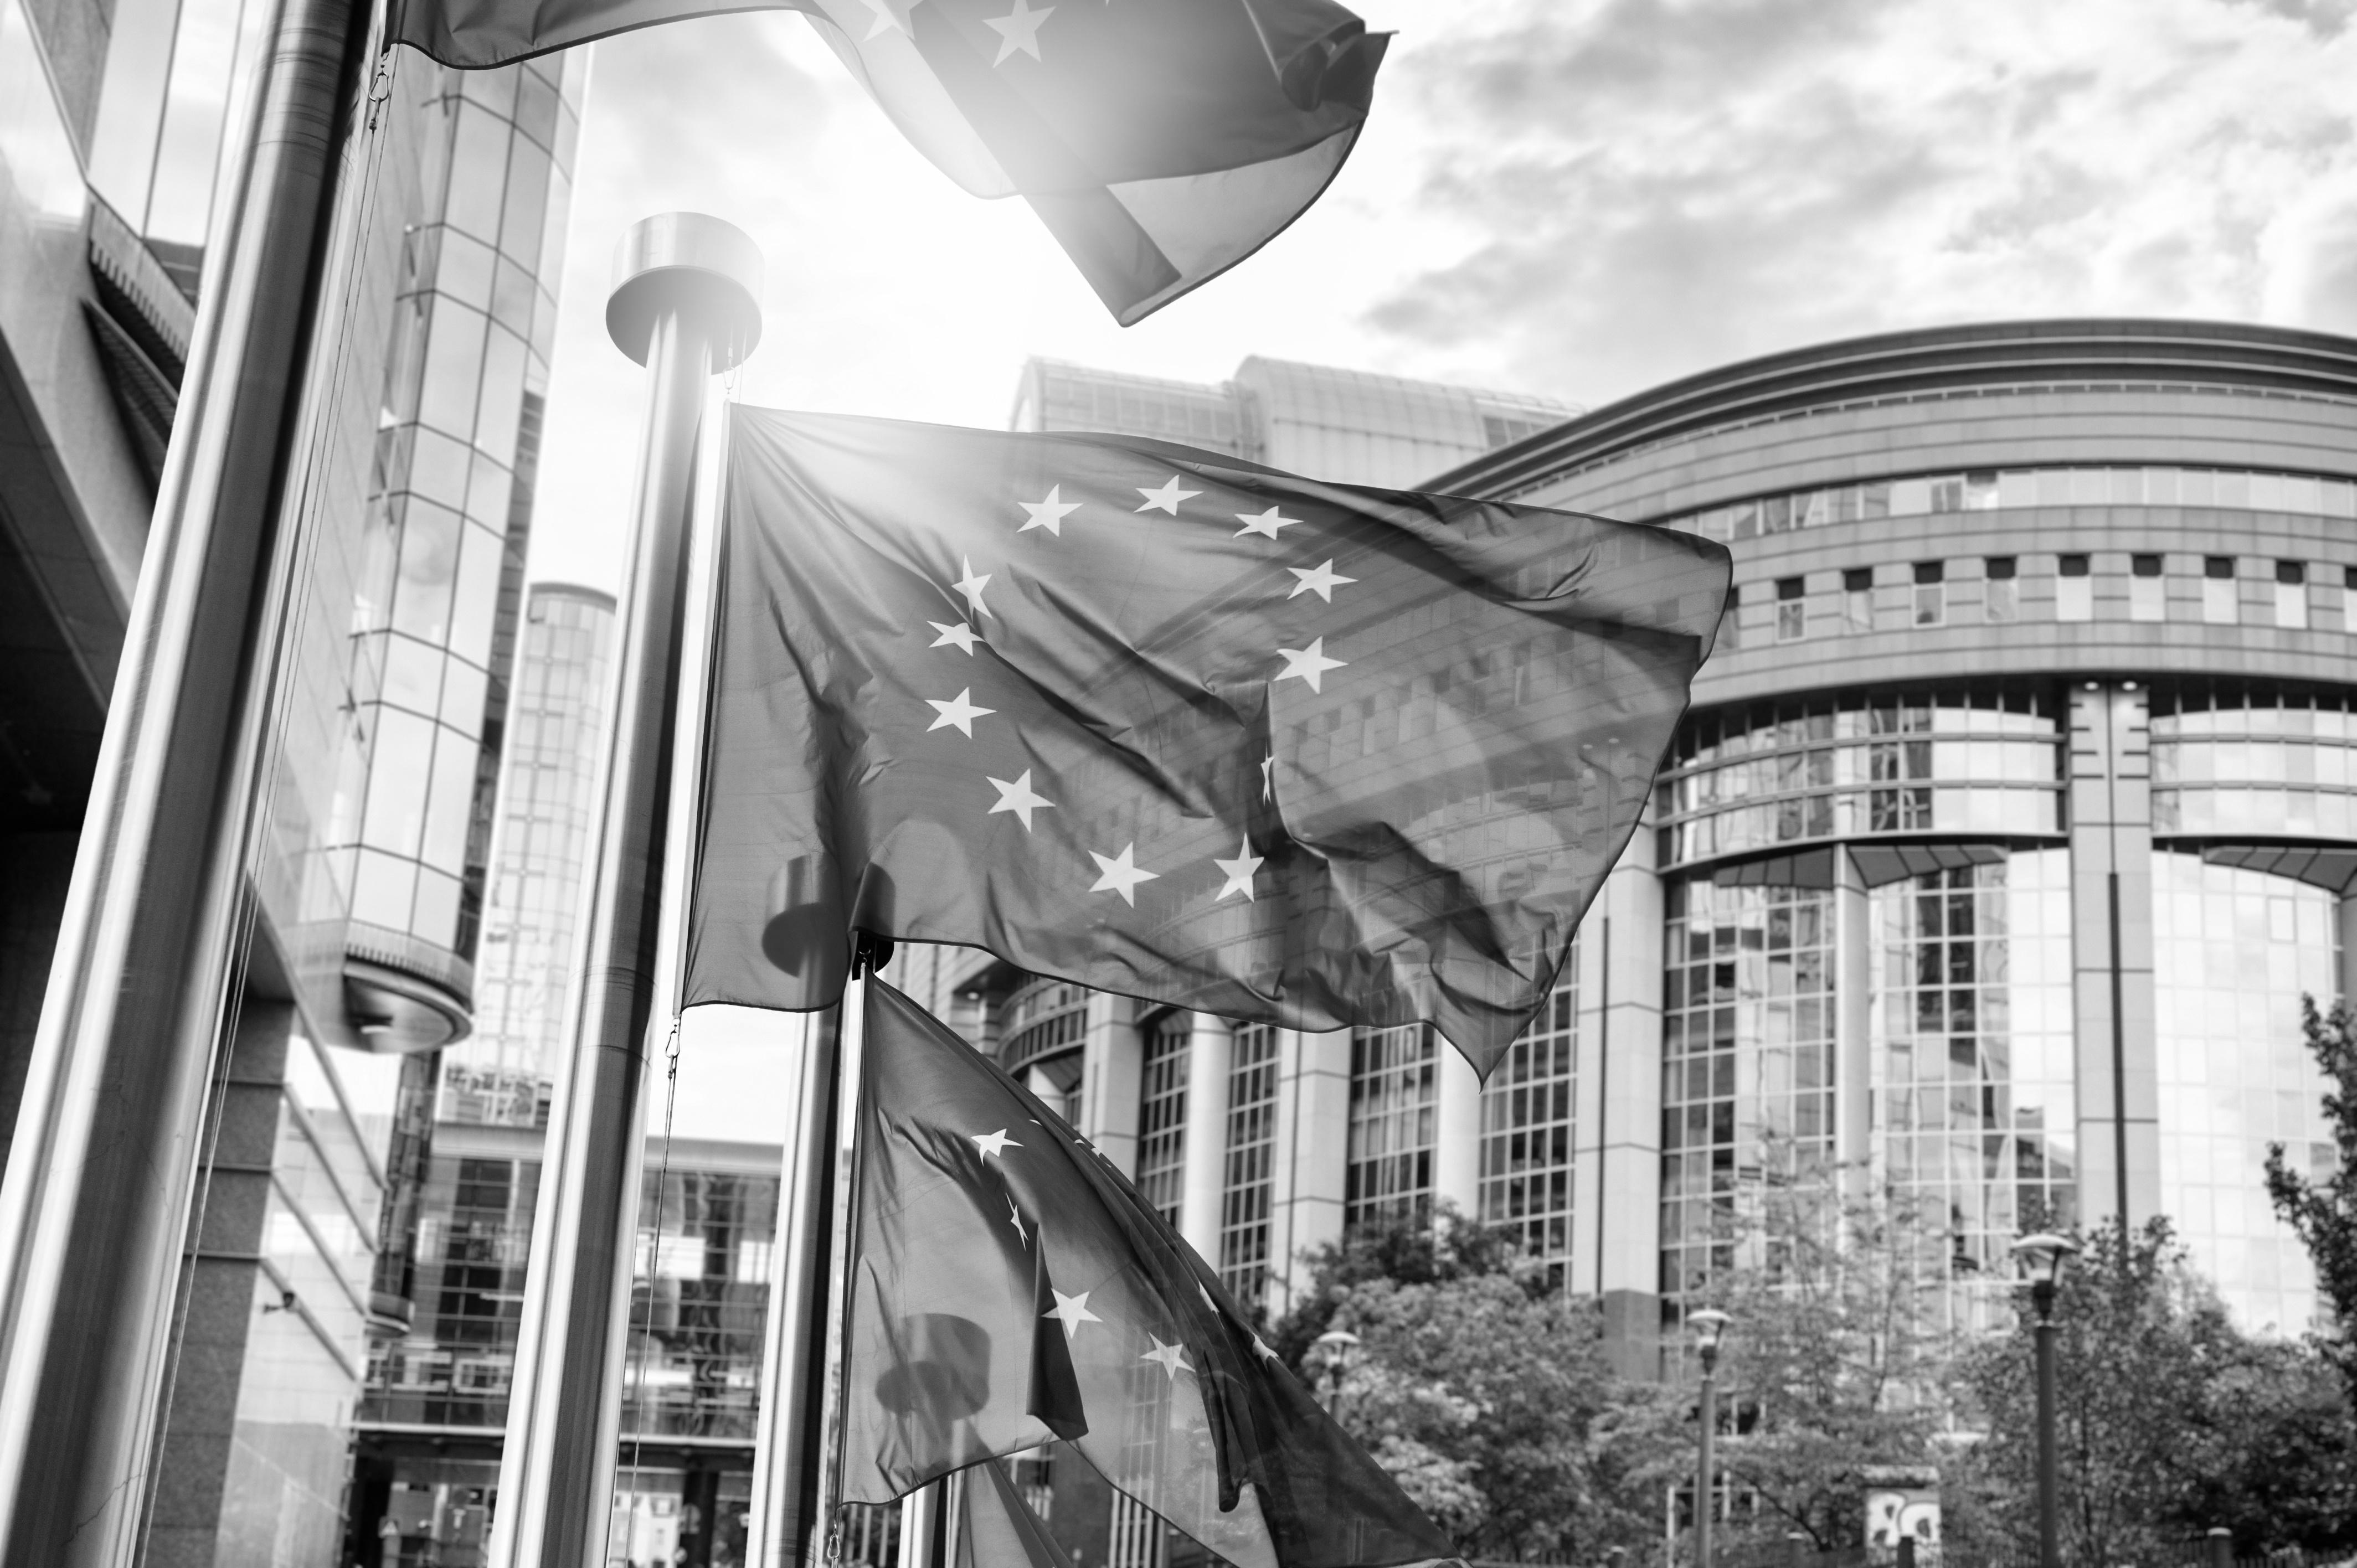 Article - Capital Markets Union